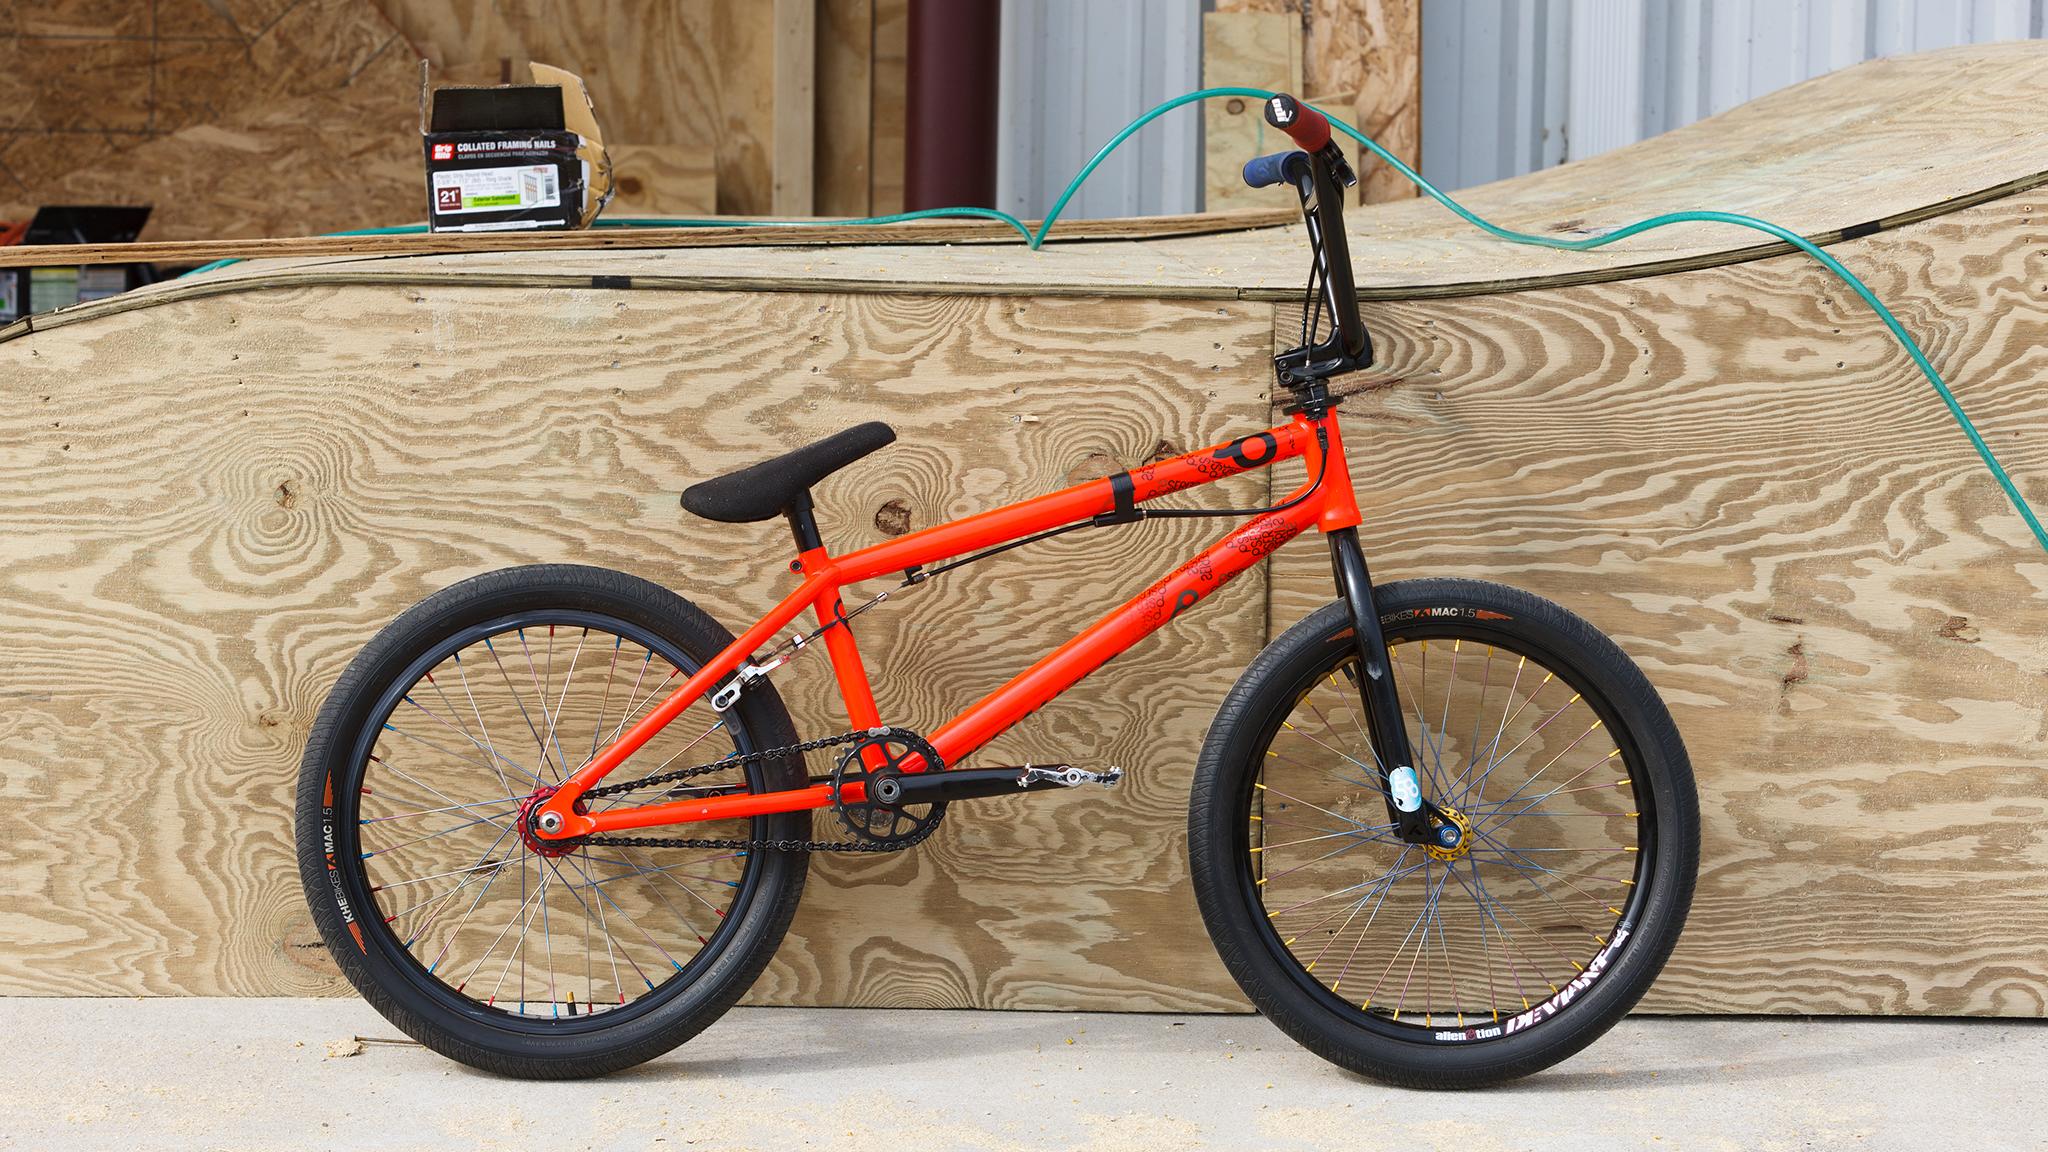 Bike overview